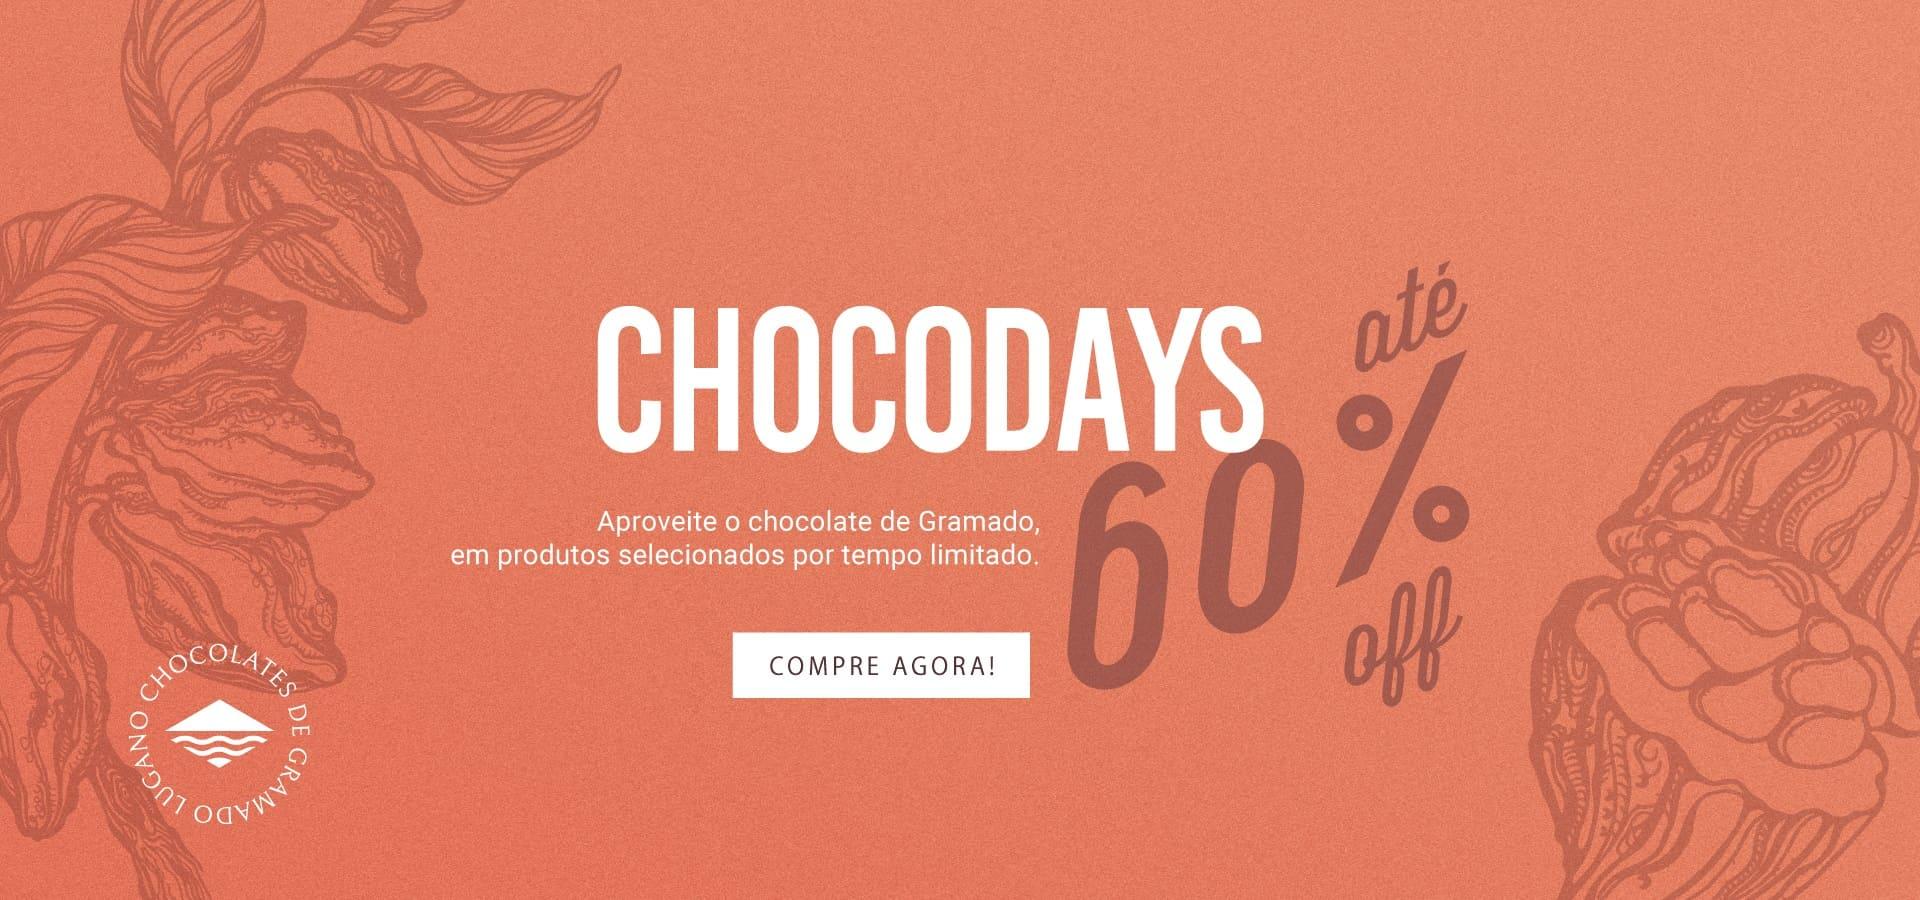 Chocodays